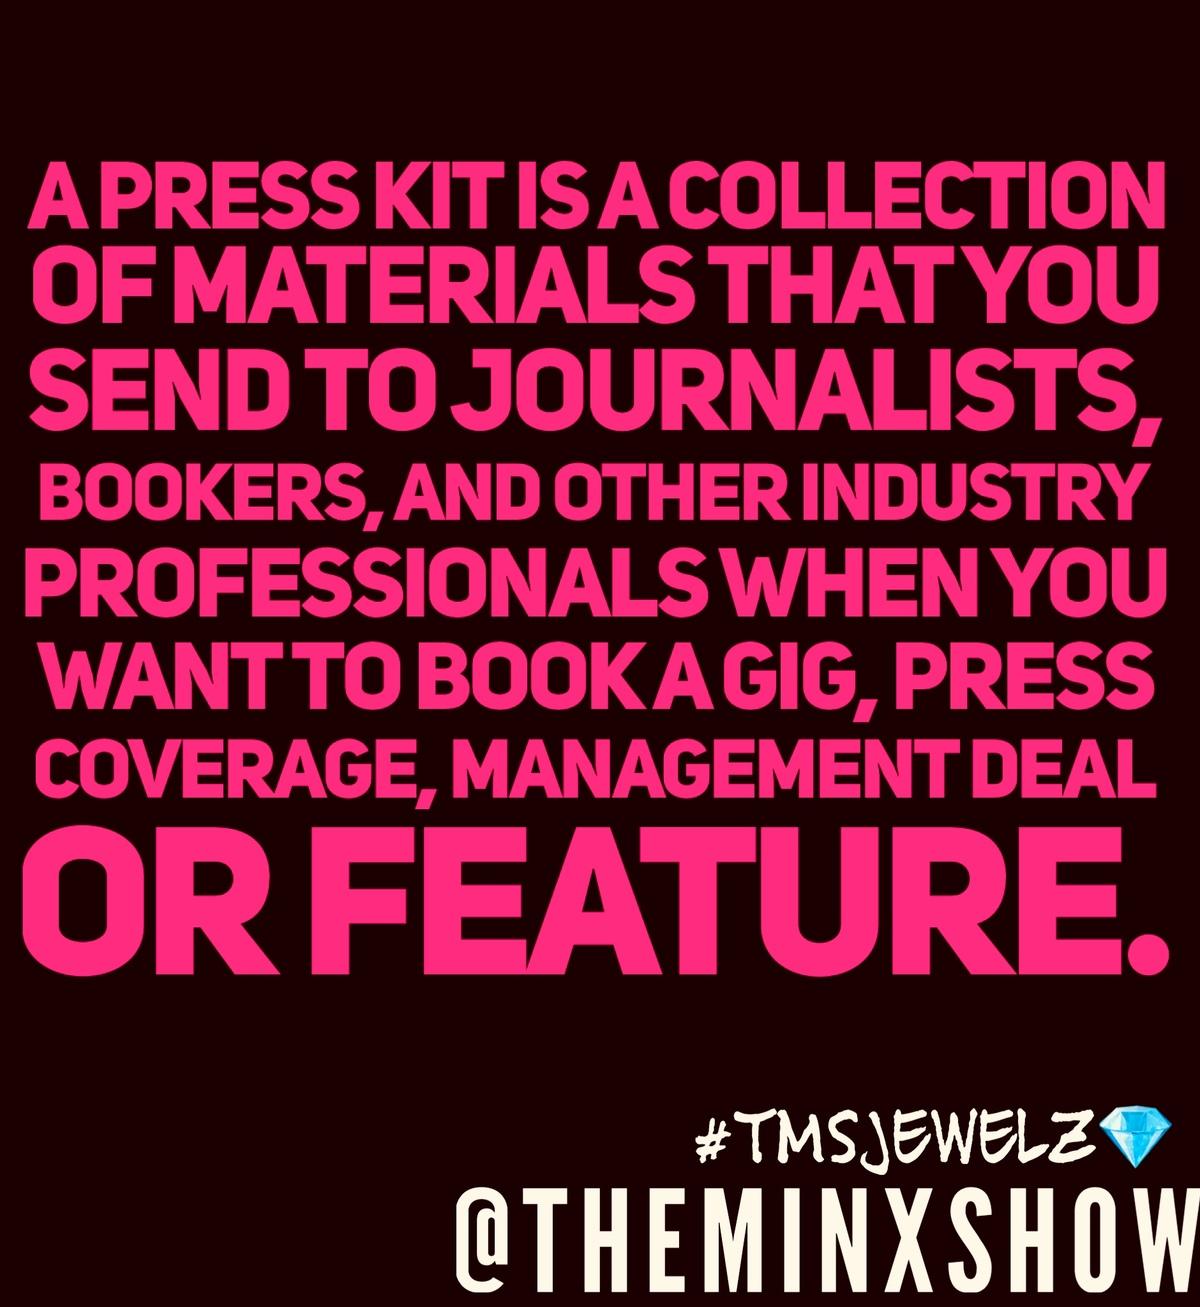 Are Press Kits Really Relavant?